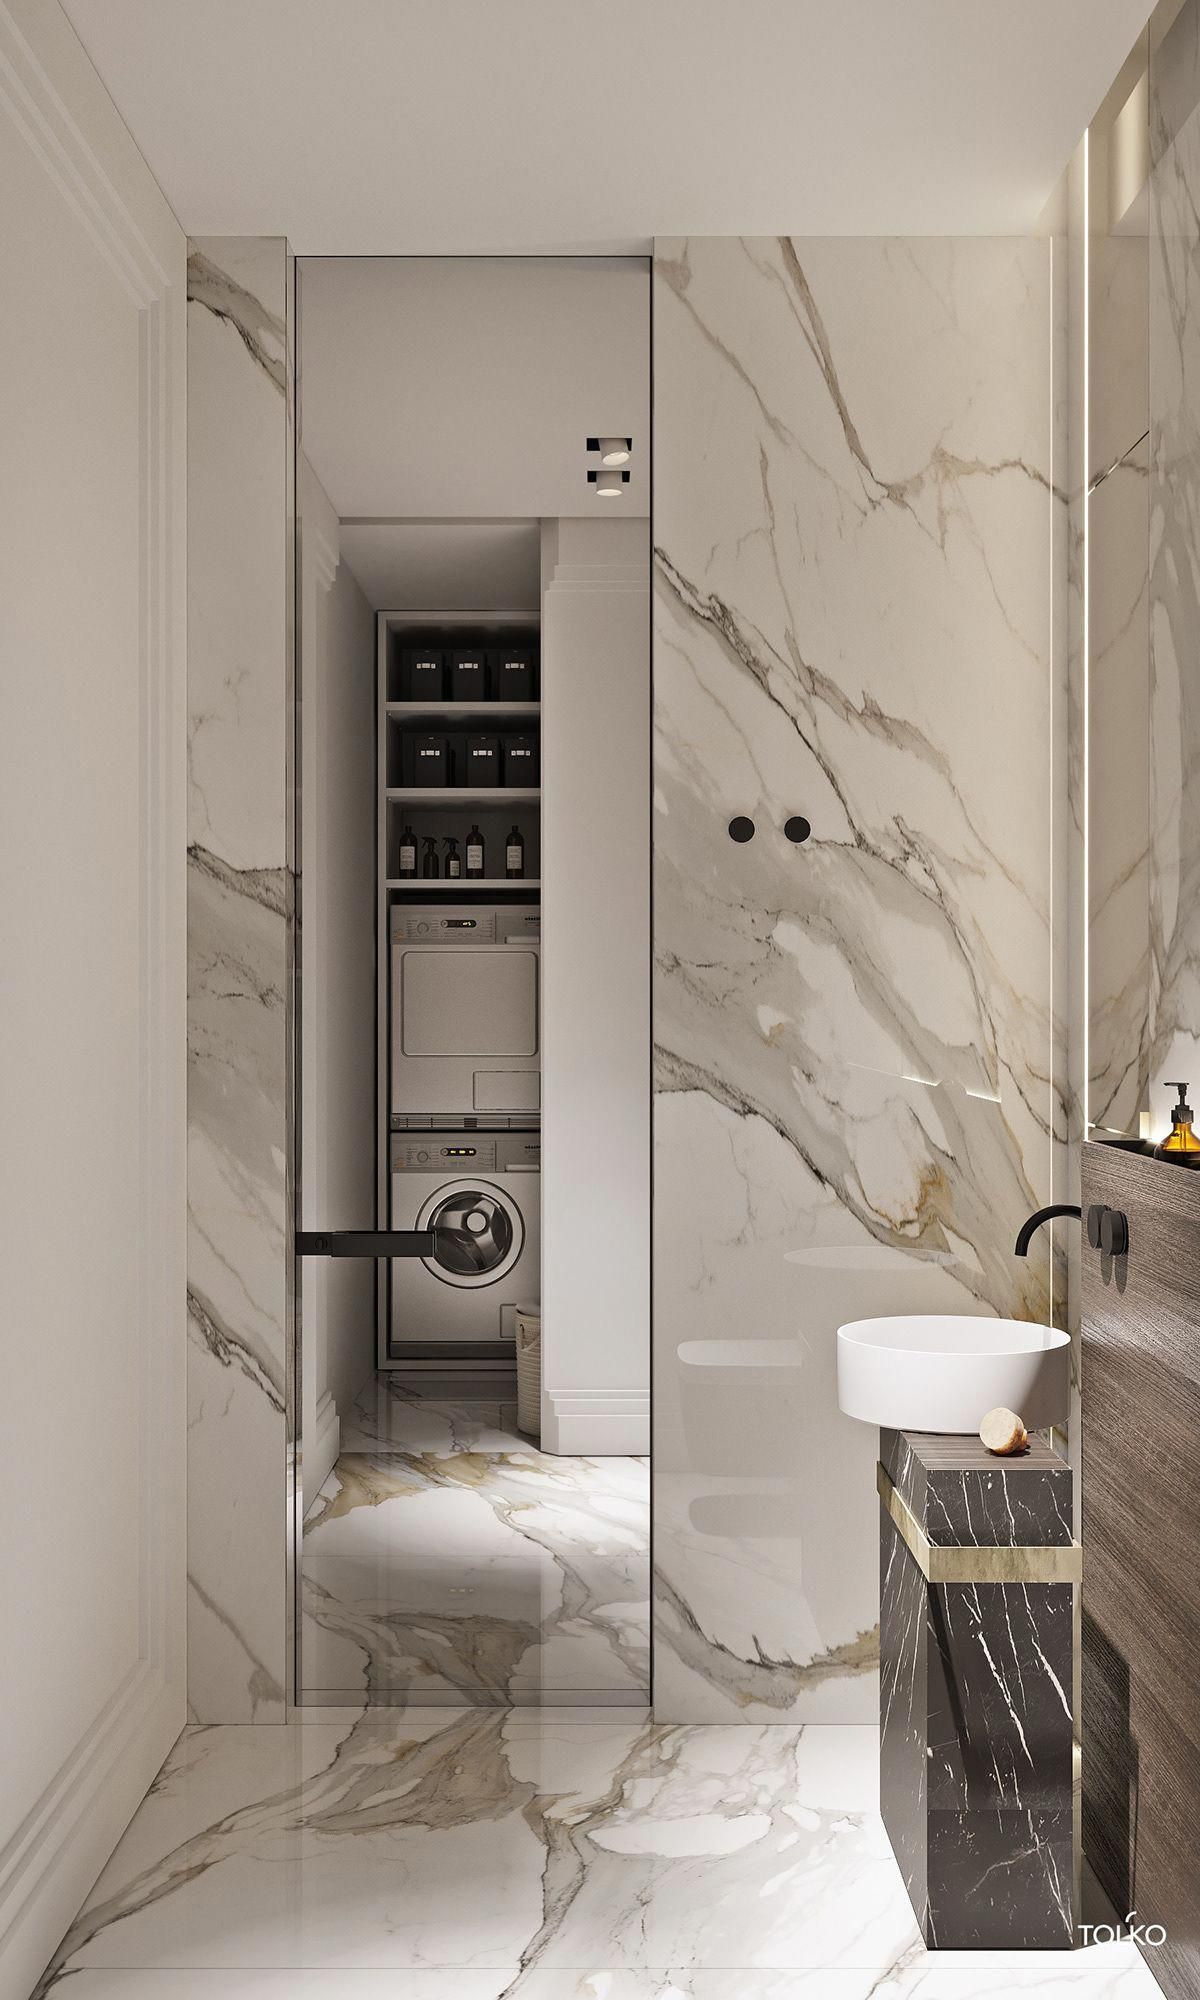 Bathroom Design Tool Free - Best Bathroom Design 2020